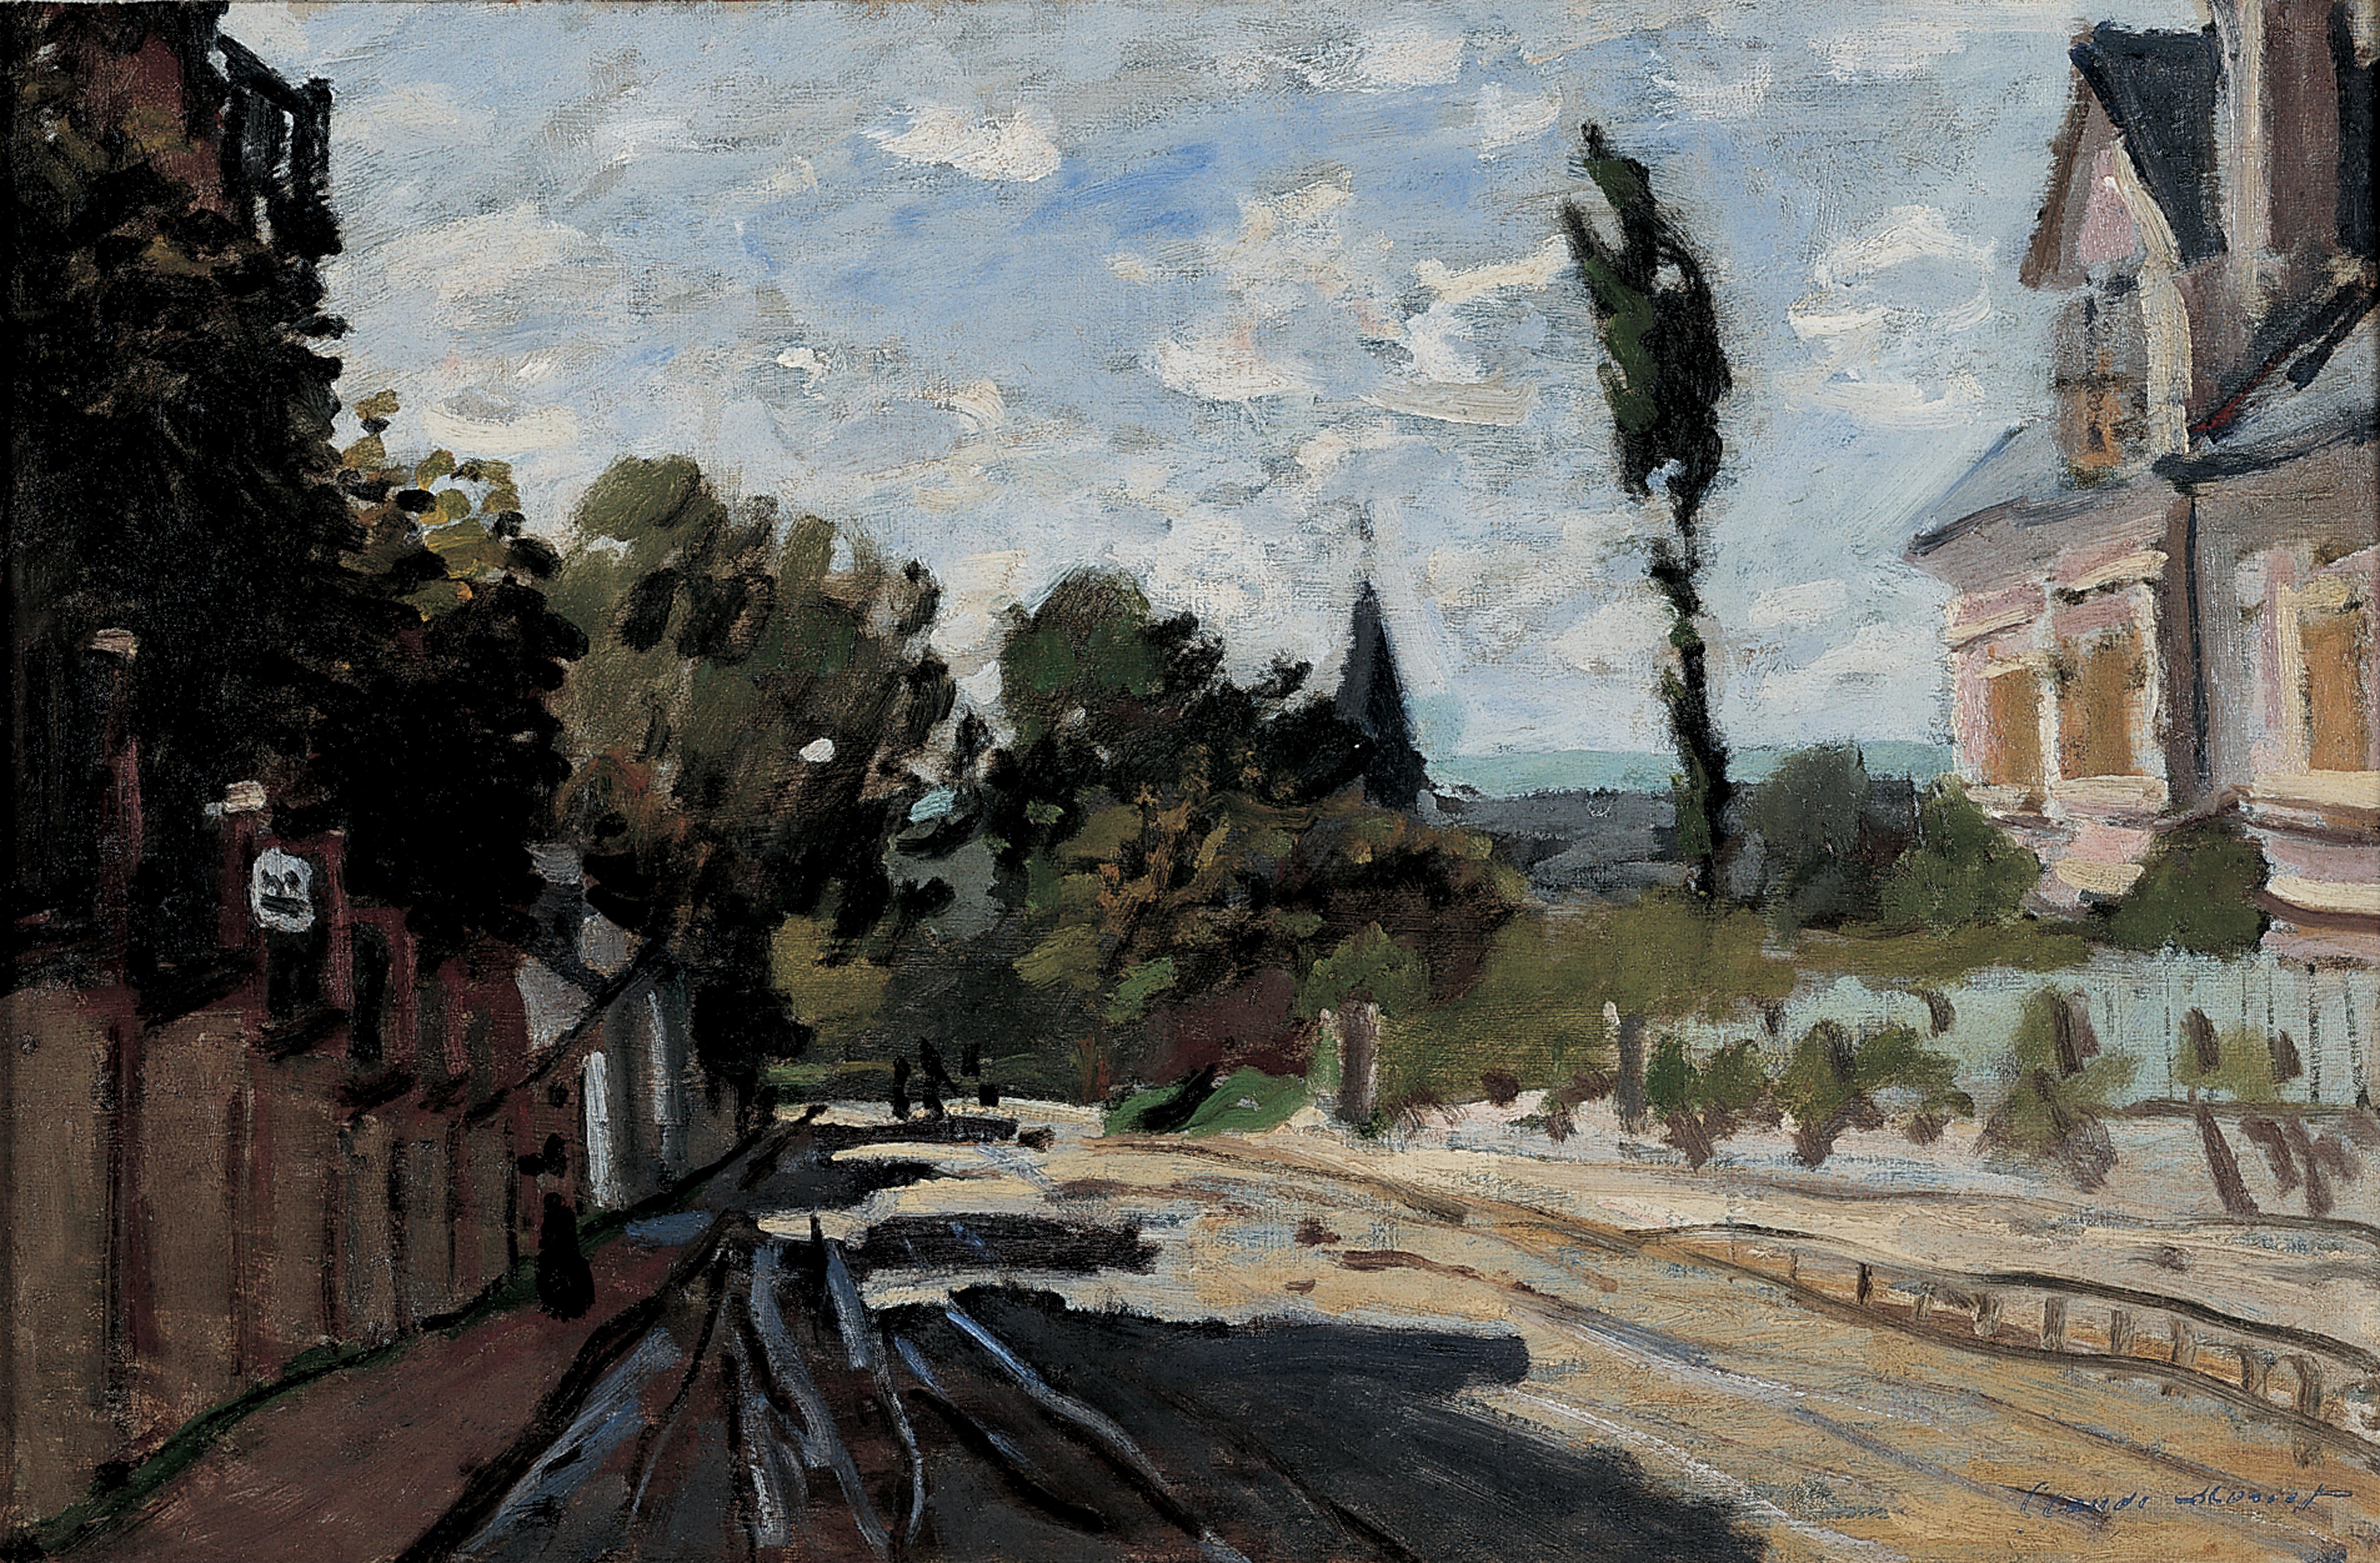 File:Claude Monet - Village Street, ca. 1869-71, Dixon Gallery.jpgdixon village